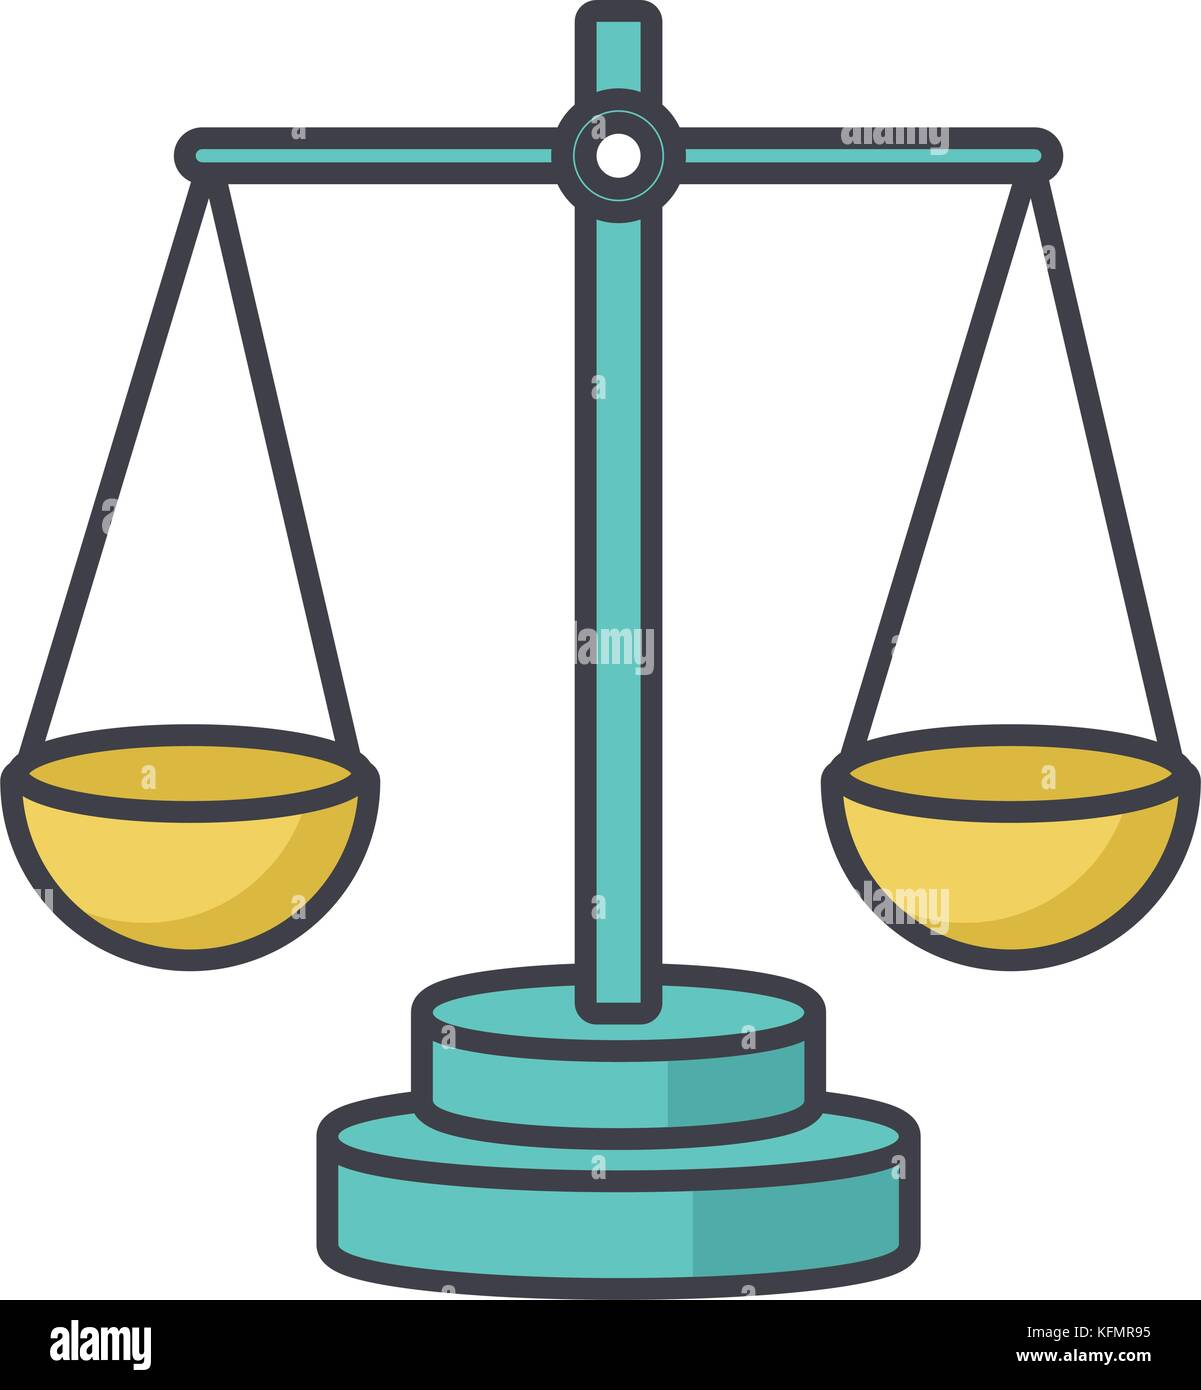 Justice balance symbol stock vector art illustration vector image justice balance symbol biocorpaavc Images